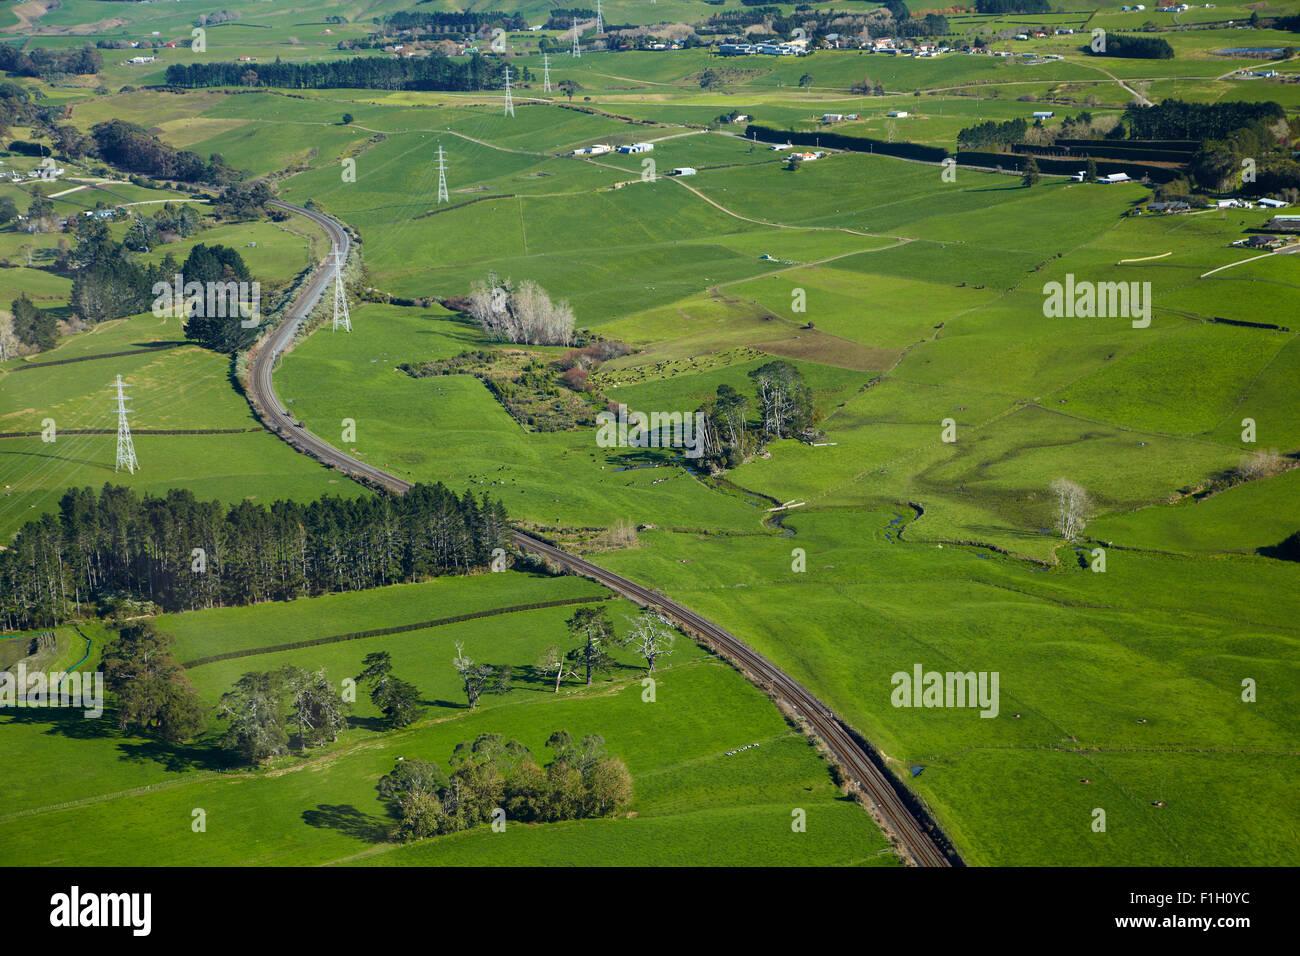 North Island Main Trunk Railway Line near Paerata, South Auckland, North Island, New Zealand - aerial - Stock Image